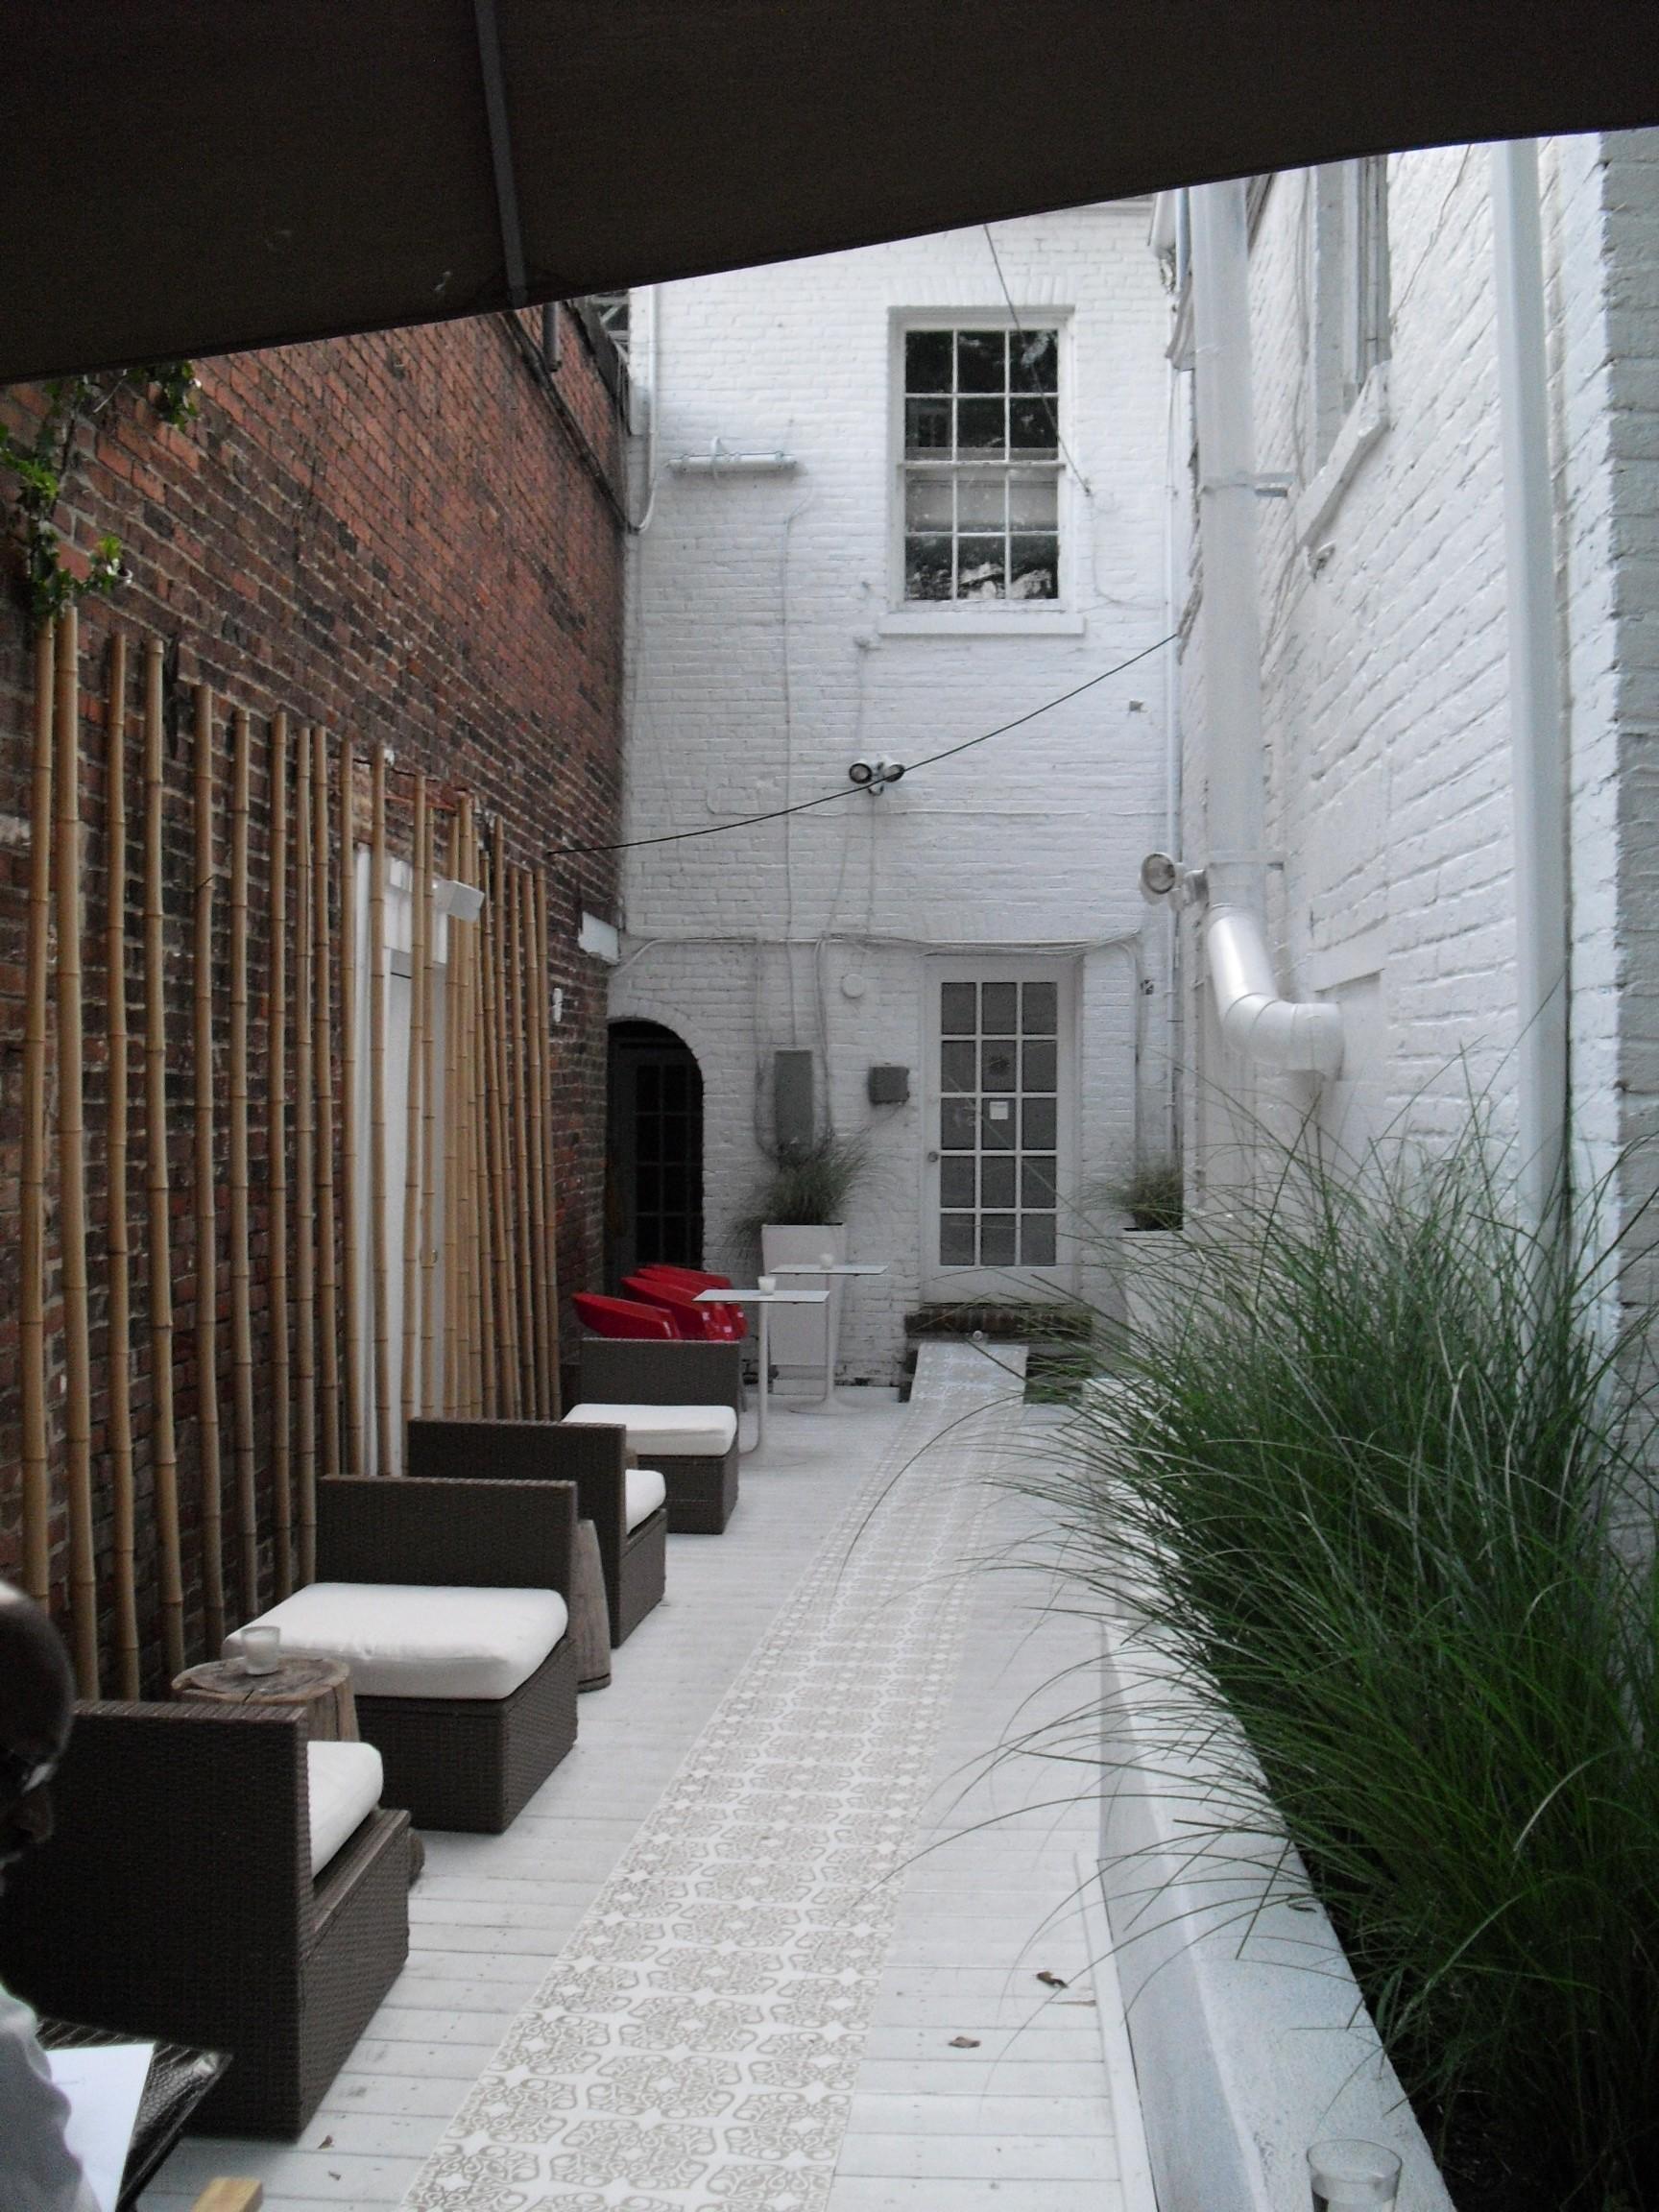 Backyard of Puro Cafe